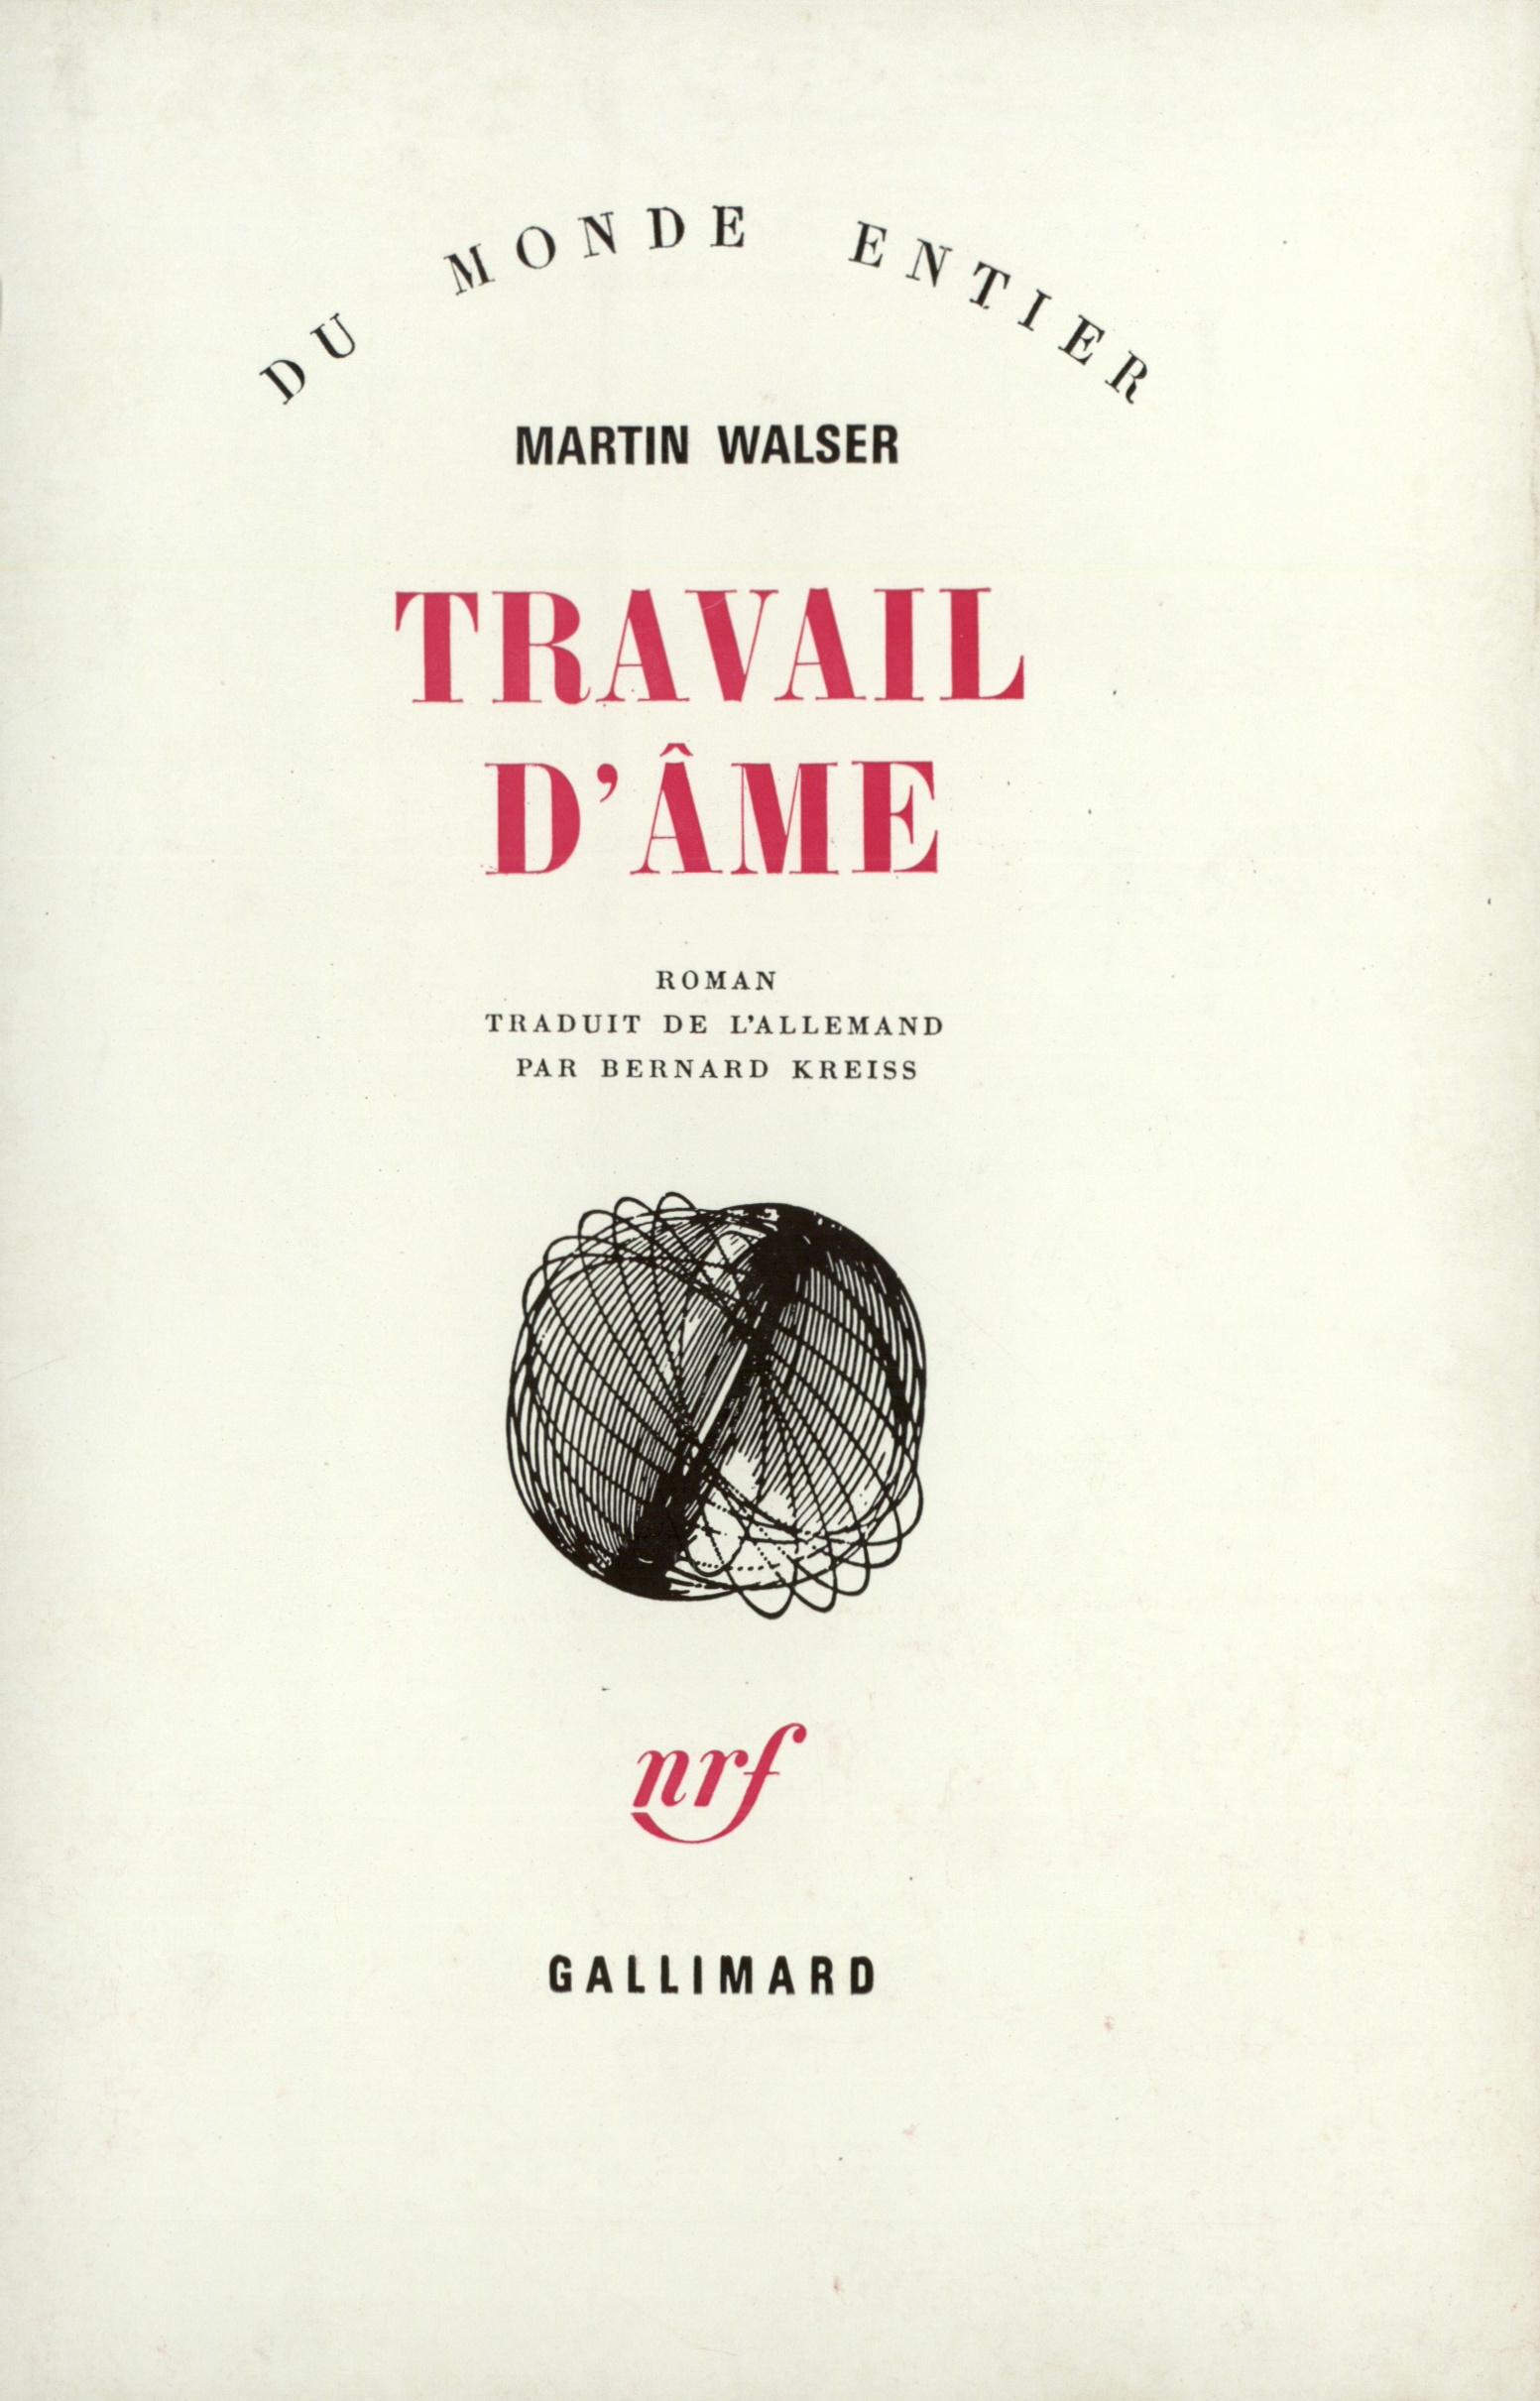 TRAVAIL D'AME